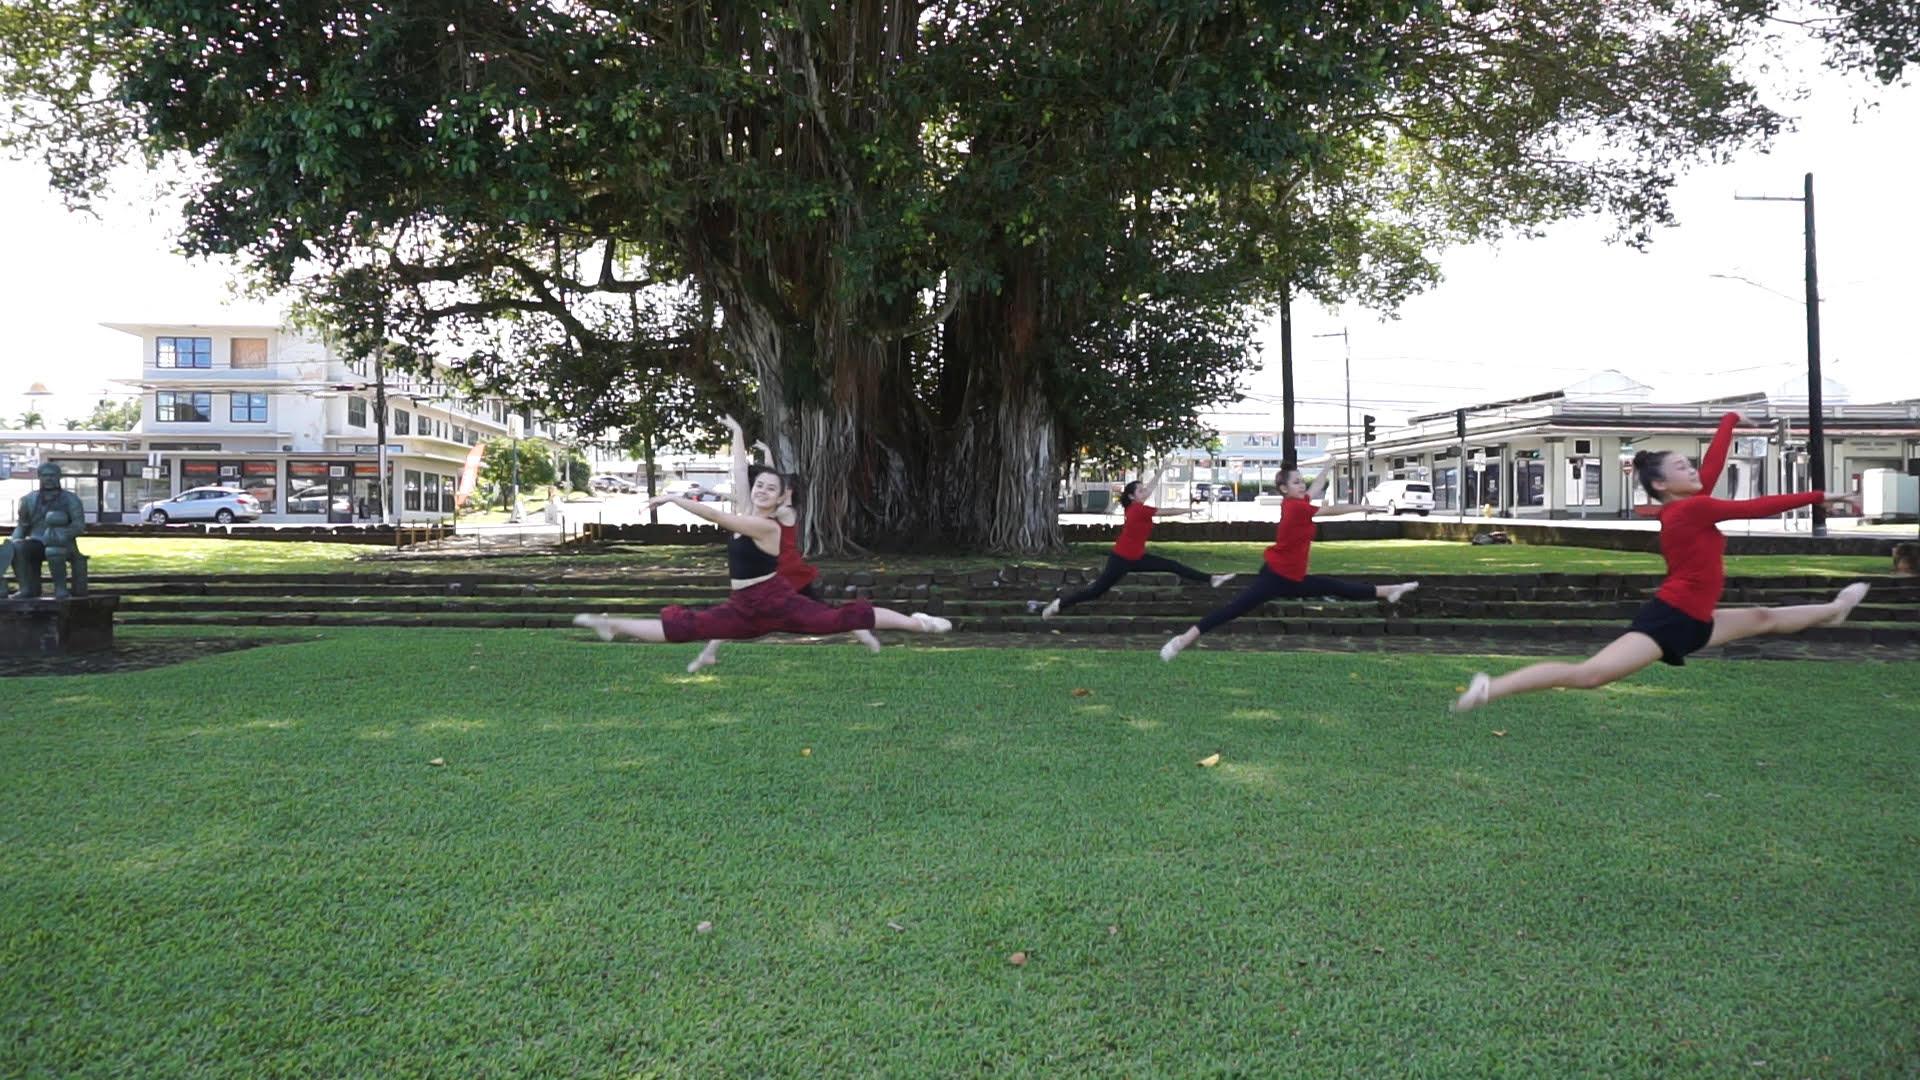 Dancers leap in unison at Kalakaua Park, Hilo.